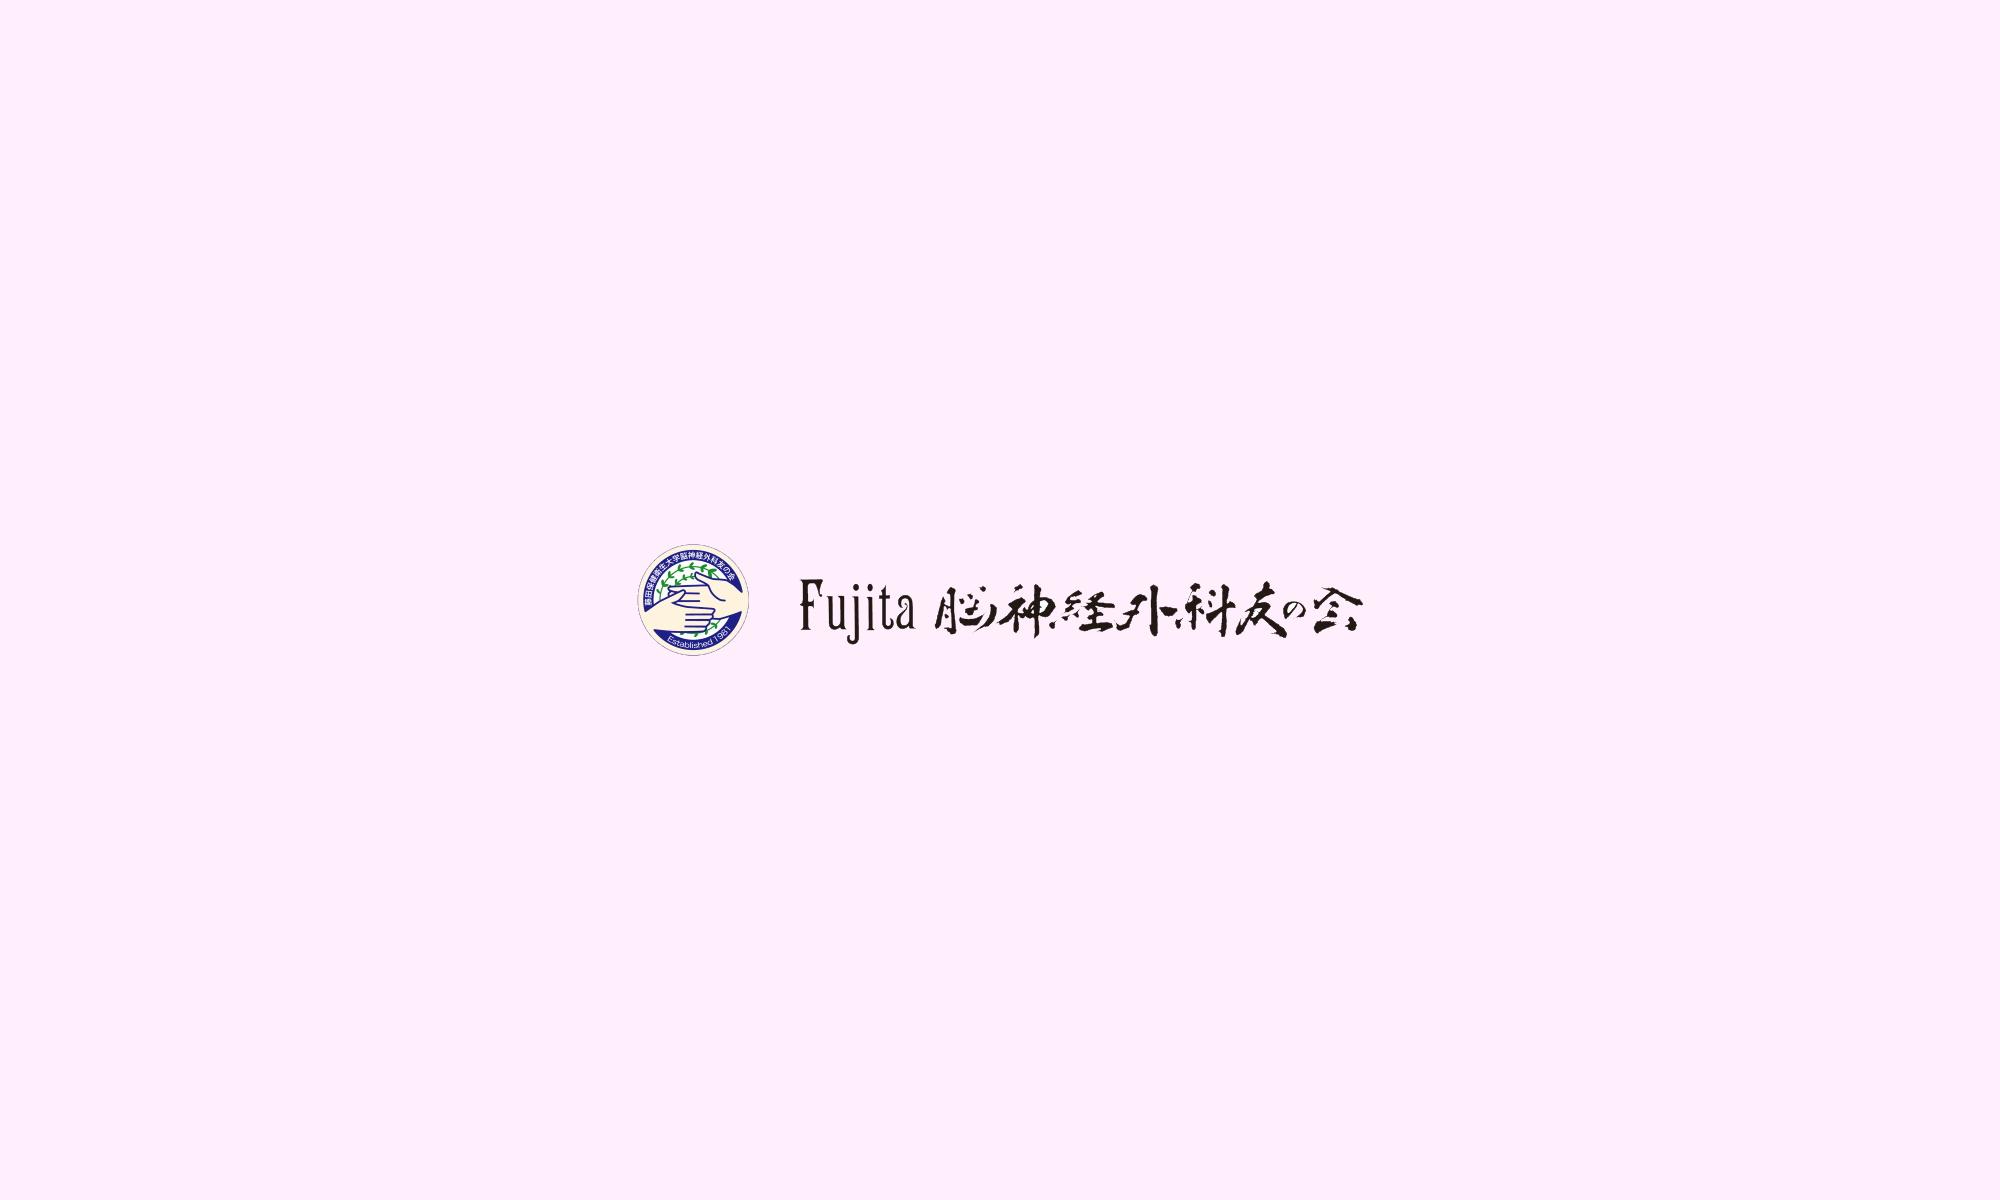 Fujita 脳神経外科友の会